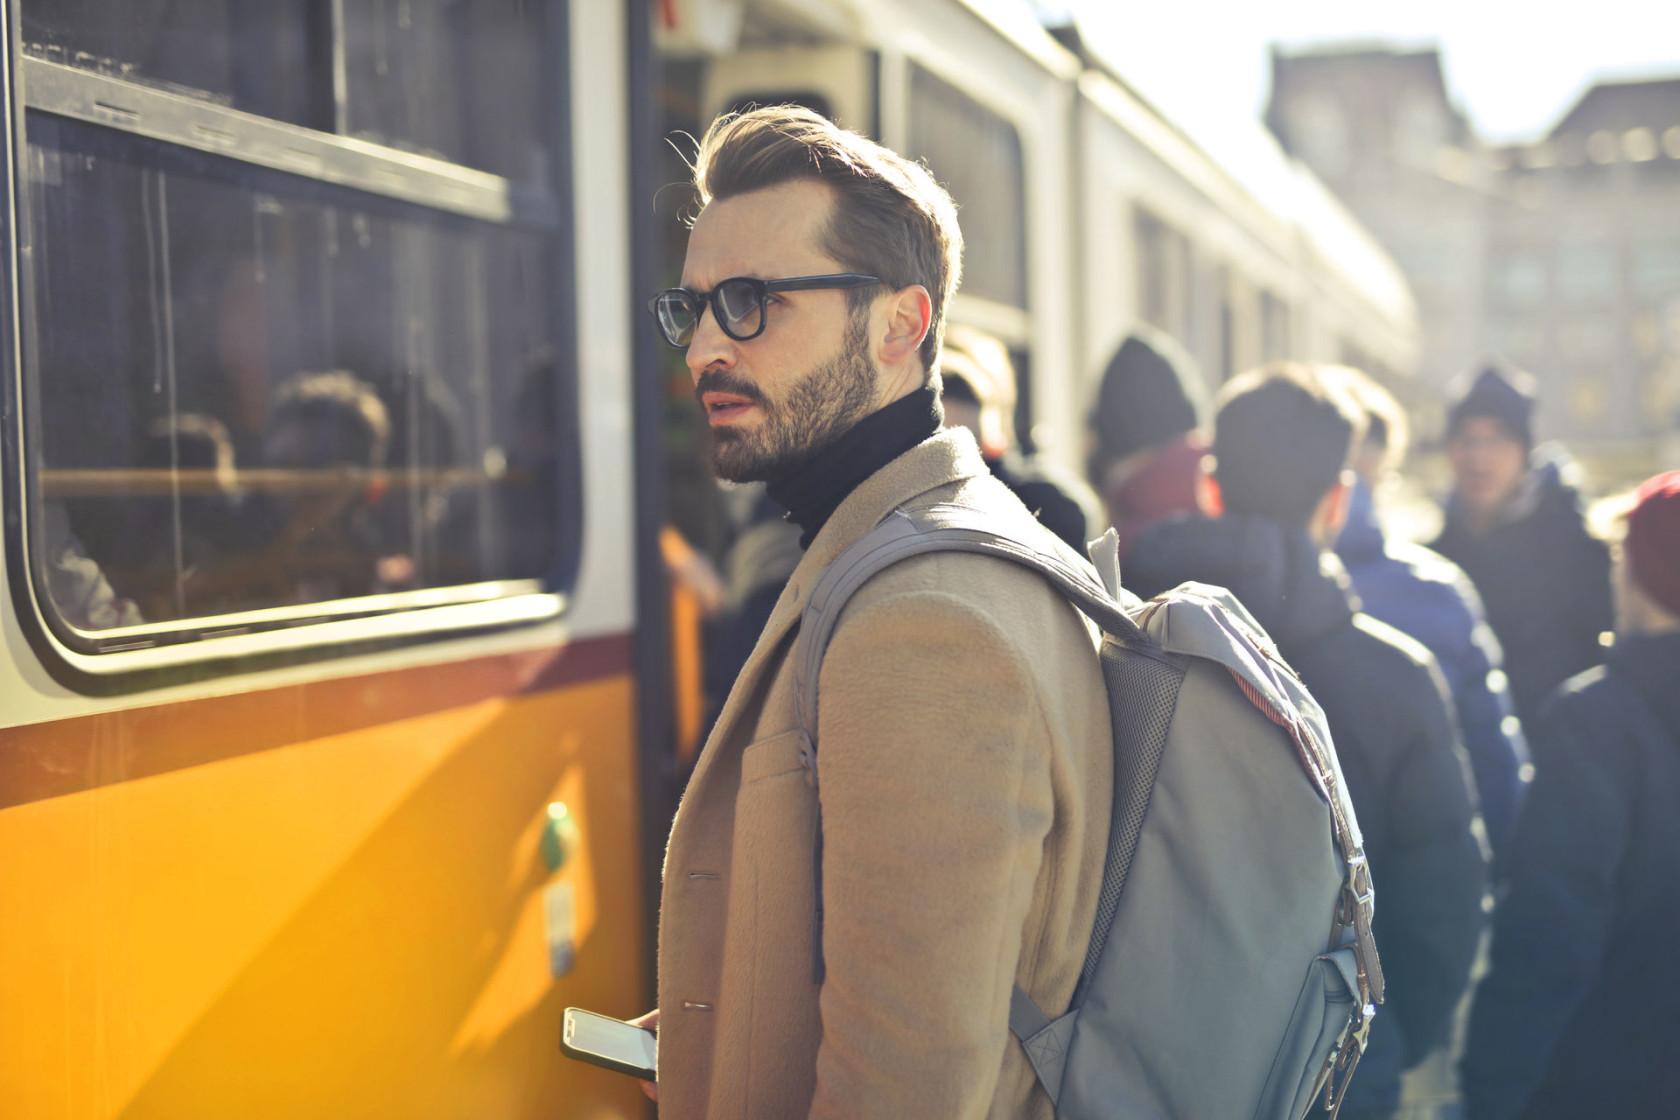 backpack-beard-city-837358.jpg